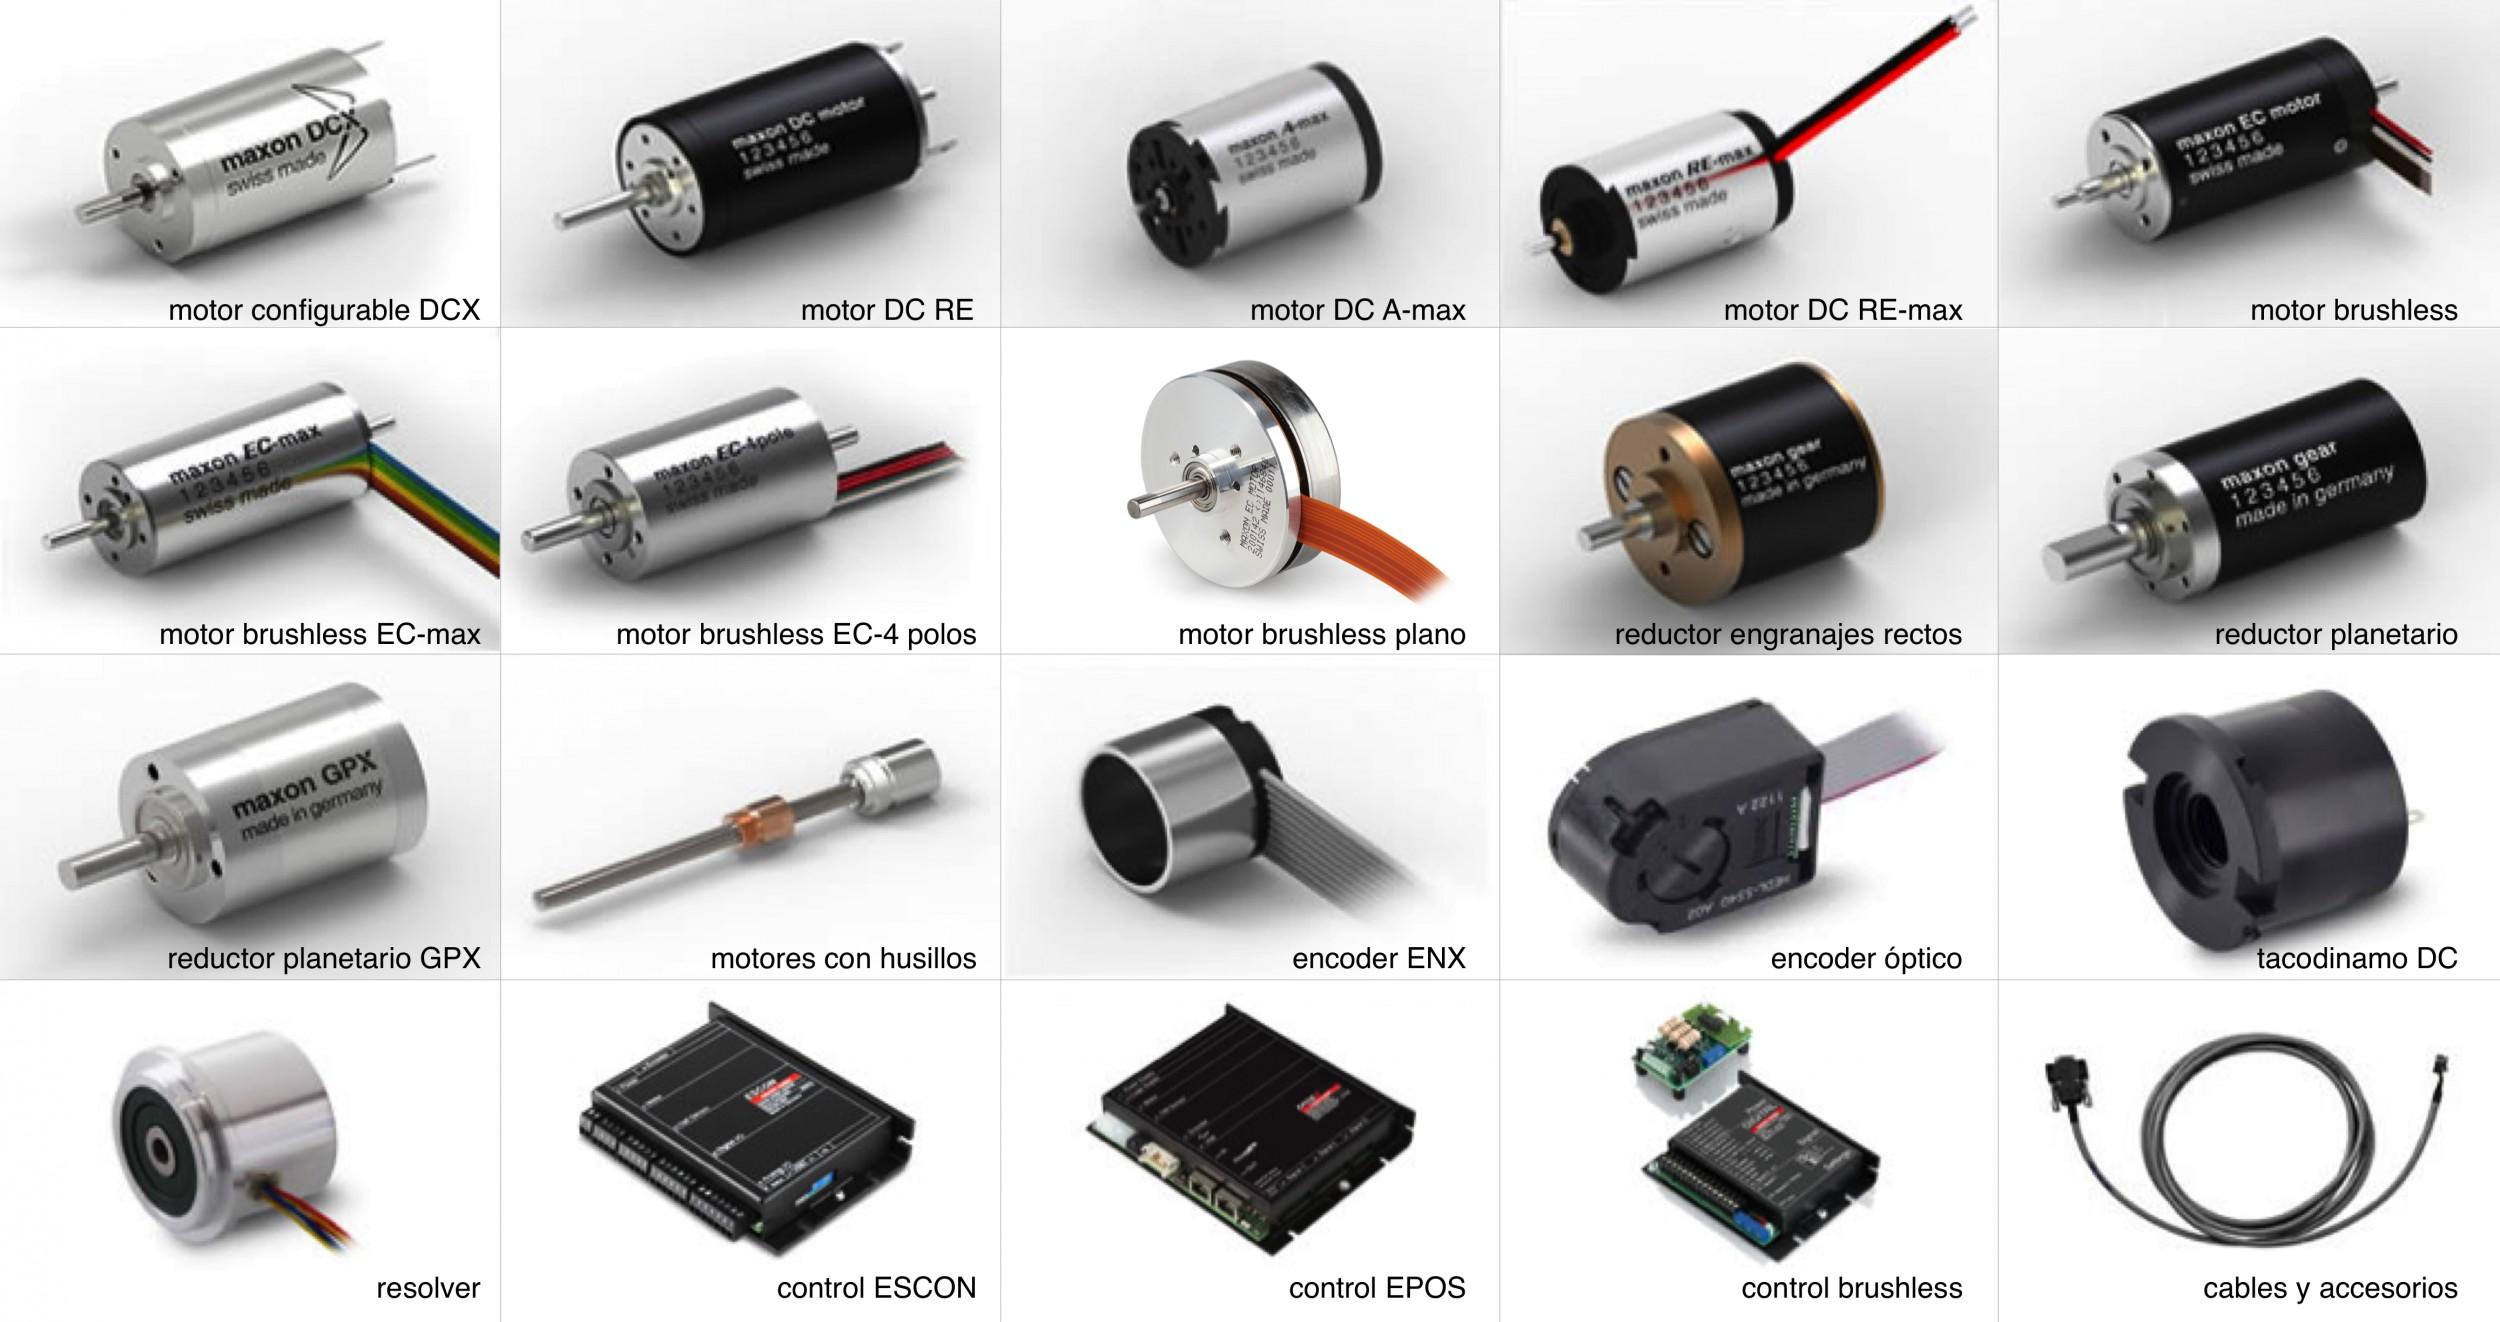 motores dc y motores brushless